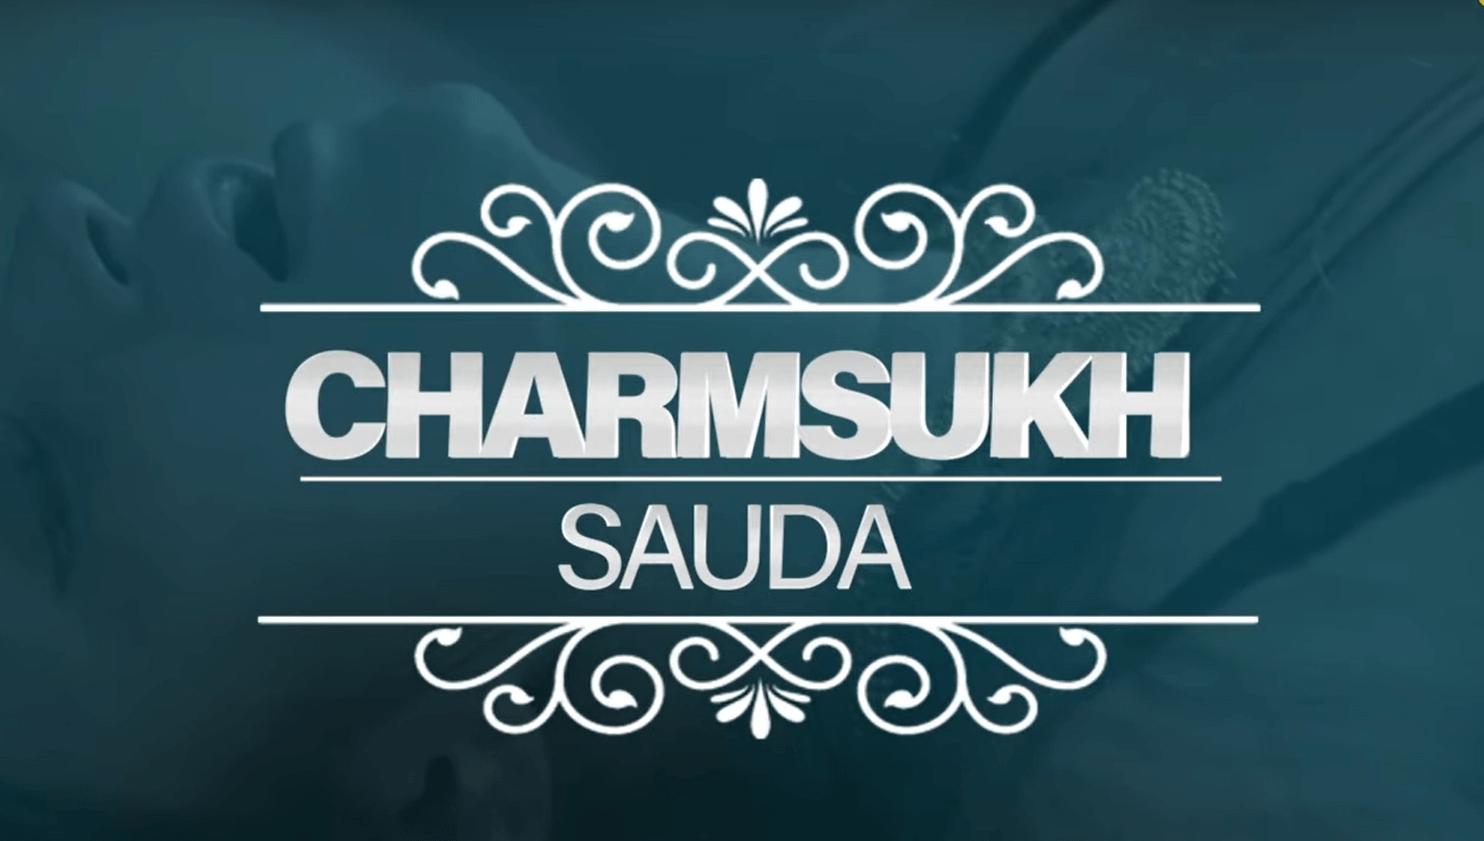 Charmsukh Sauda Webseries